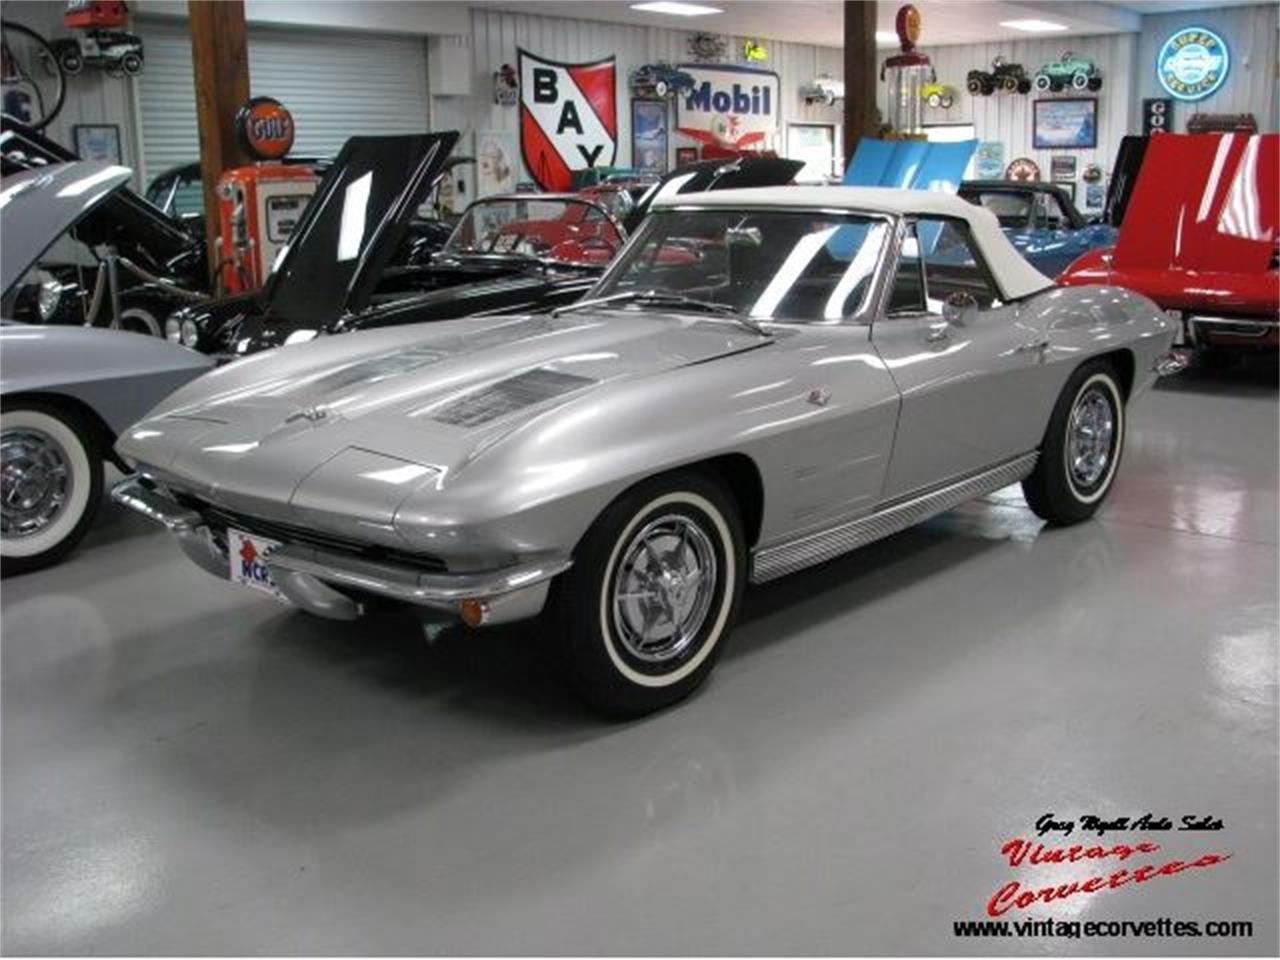 1963 Chevrolet Corvette (CC-1190243) for sale in Summerville, Georgia